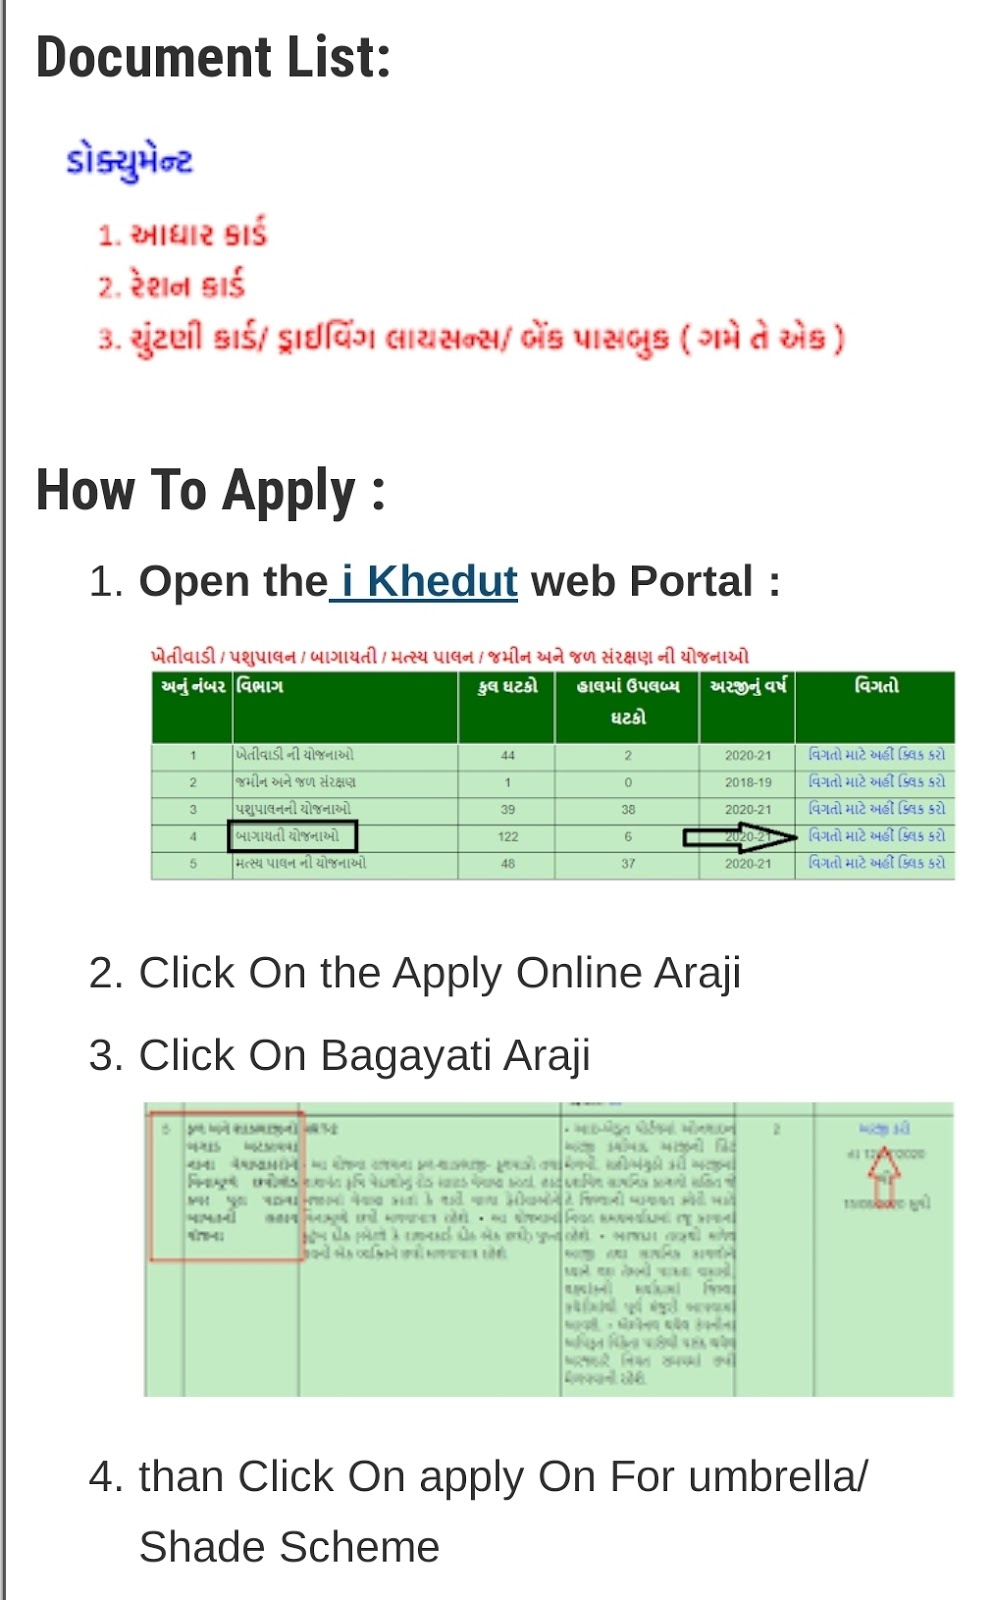 Umbrella/ Shade Scheme For Fruits And Vegetable Vendor In Gujarat